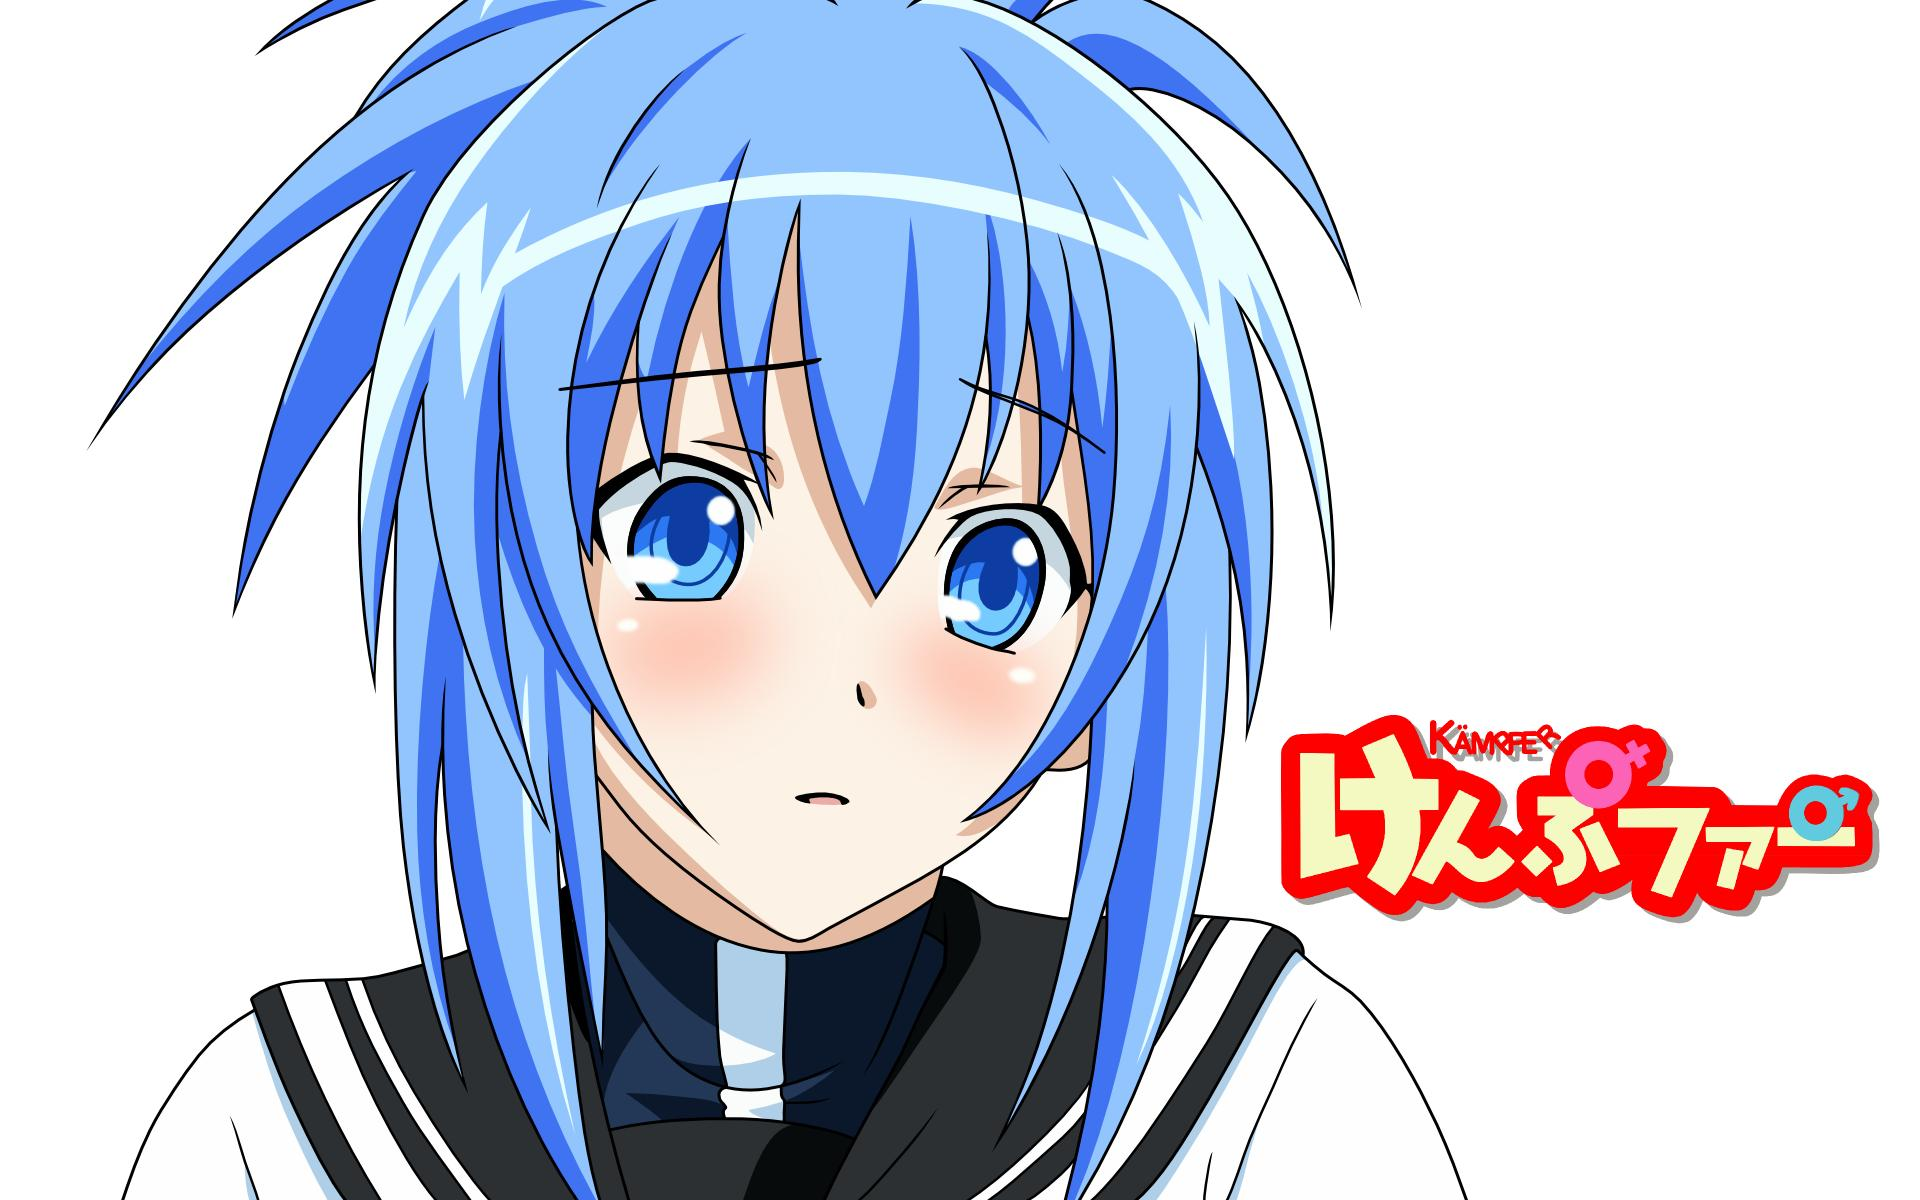 http://blog-imgs-43.fc2.com/a/n/k/ankosokuho/img_1027345_21578865_0.jpg